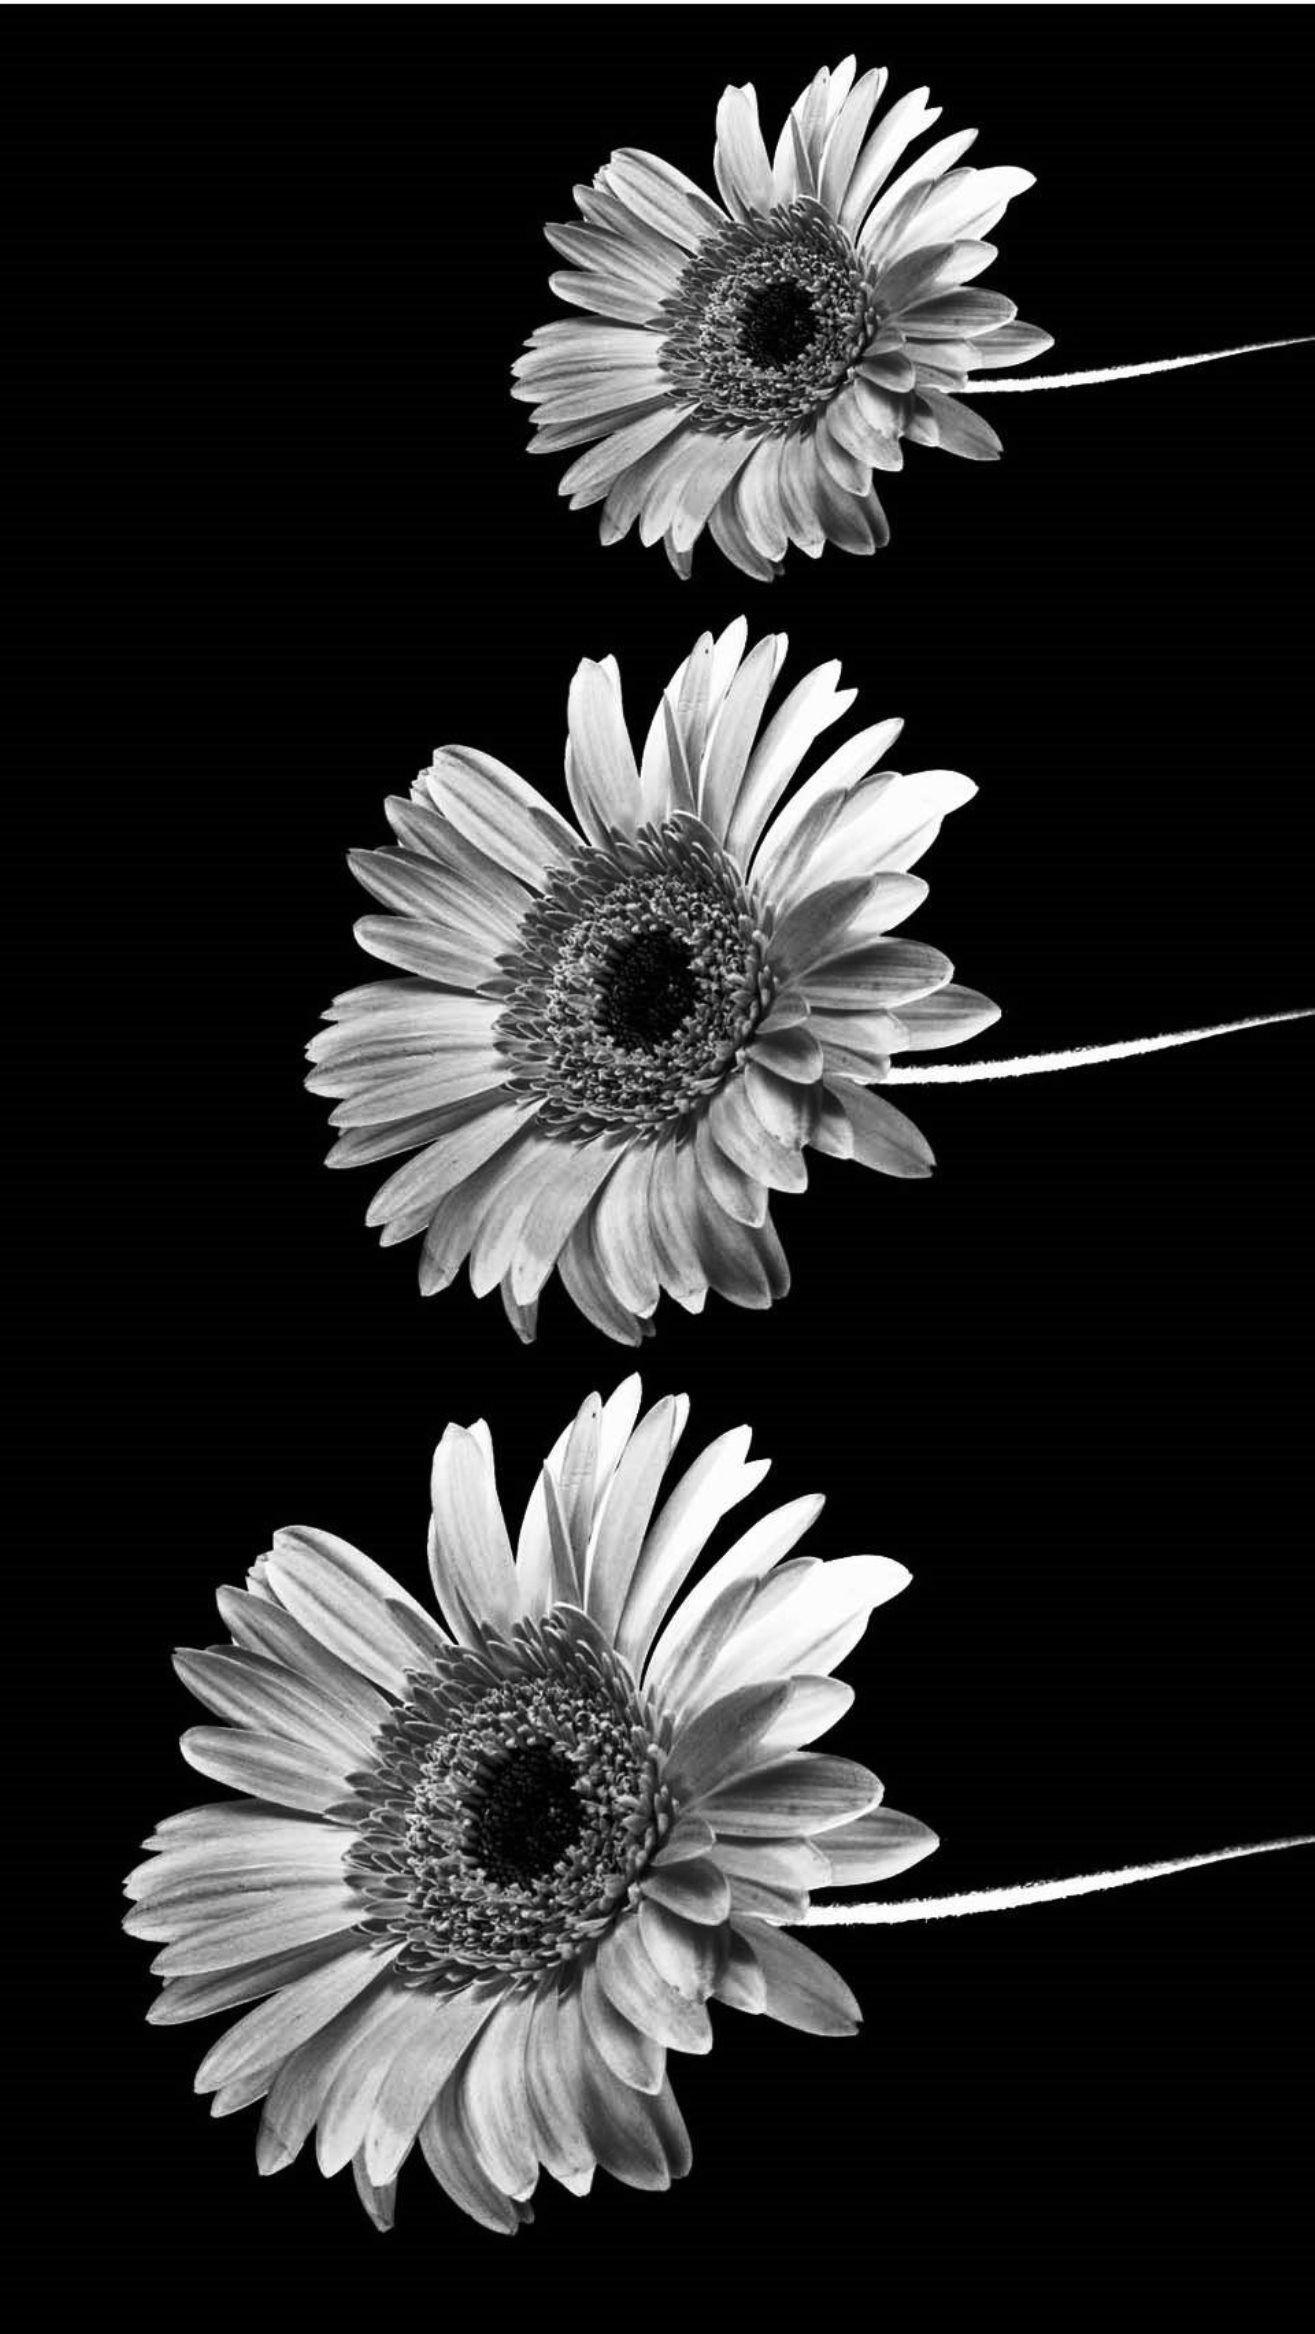 Black And White Iphone Wallpapers Tumblr Black And White Wallpaper Iphone Tumblr Iphone Wallpaper Tumblr Wallpaper